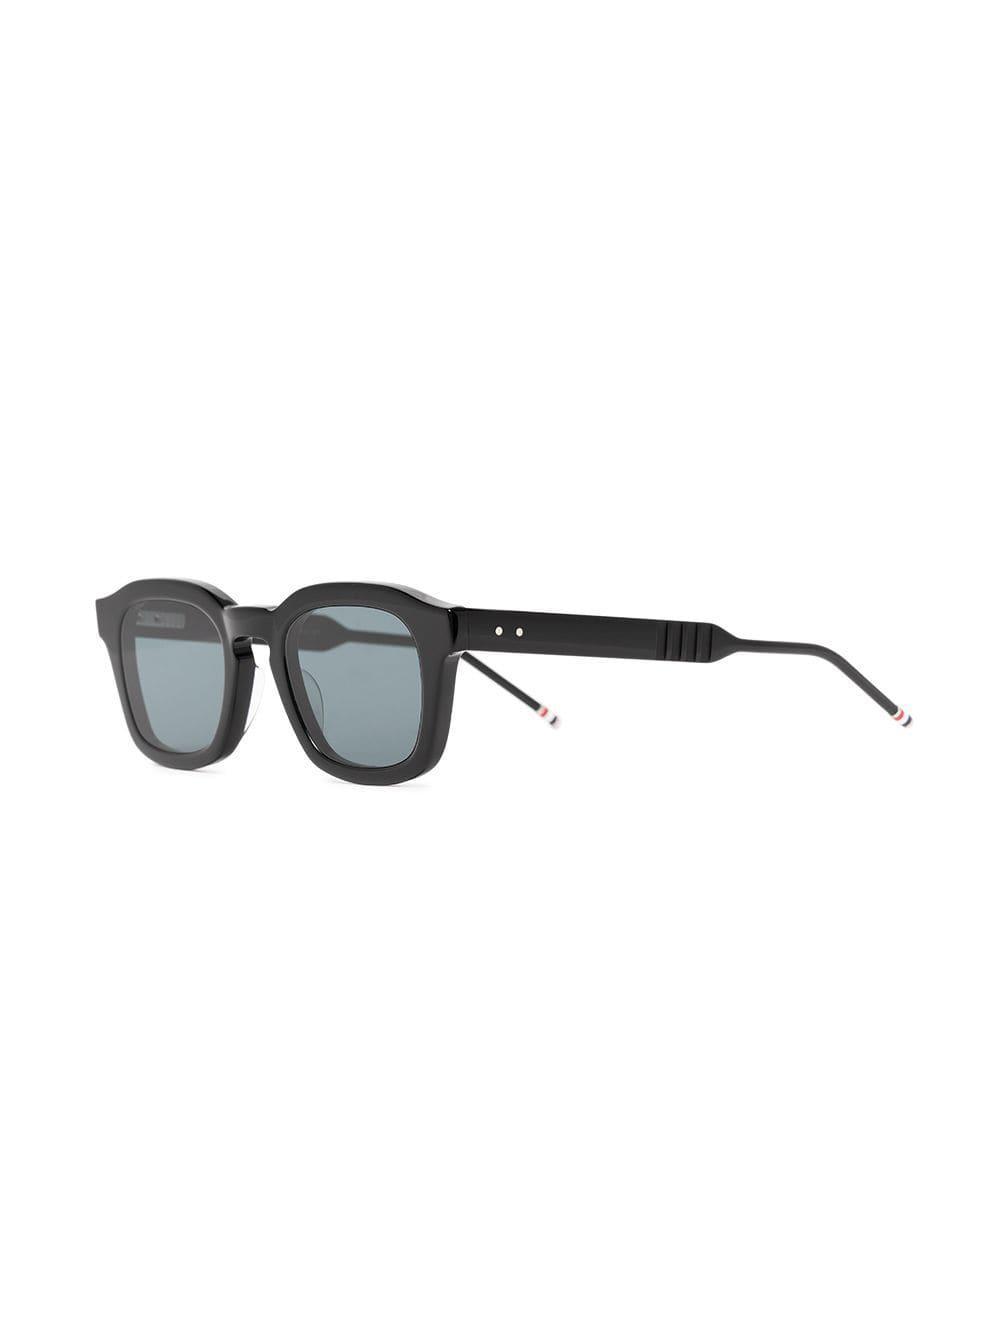 02b2f8643aa5 Thom Browne - Black 412 Sunglasses for Men - Lyst. View fullscreen